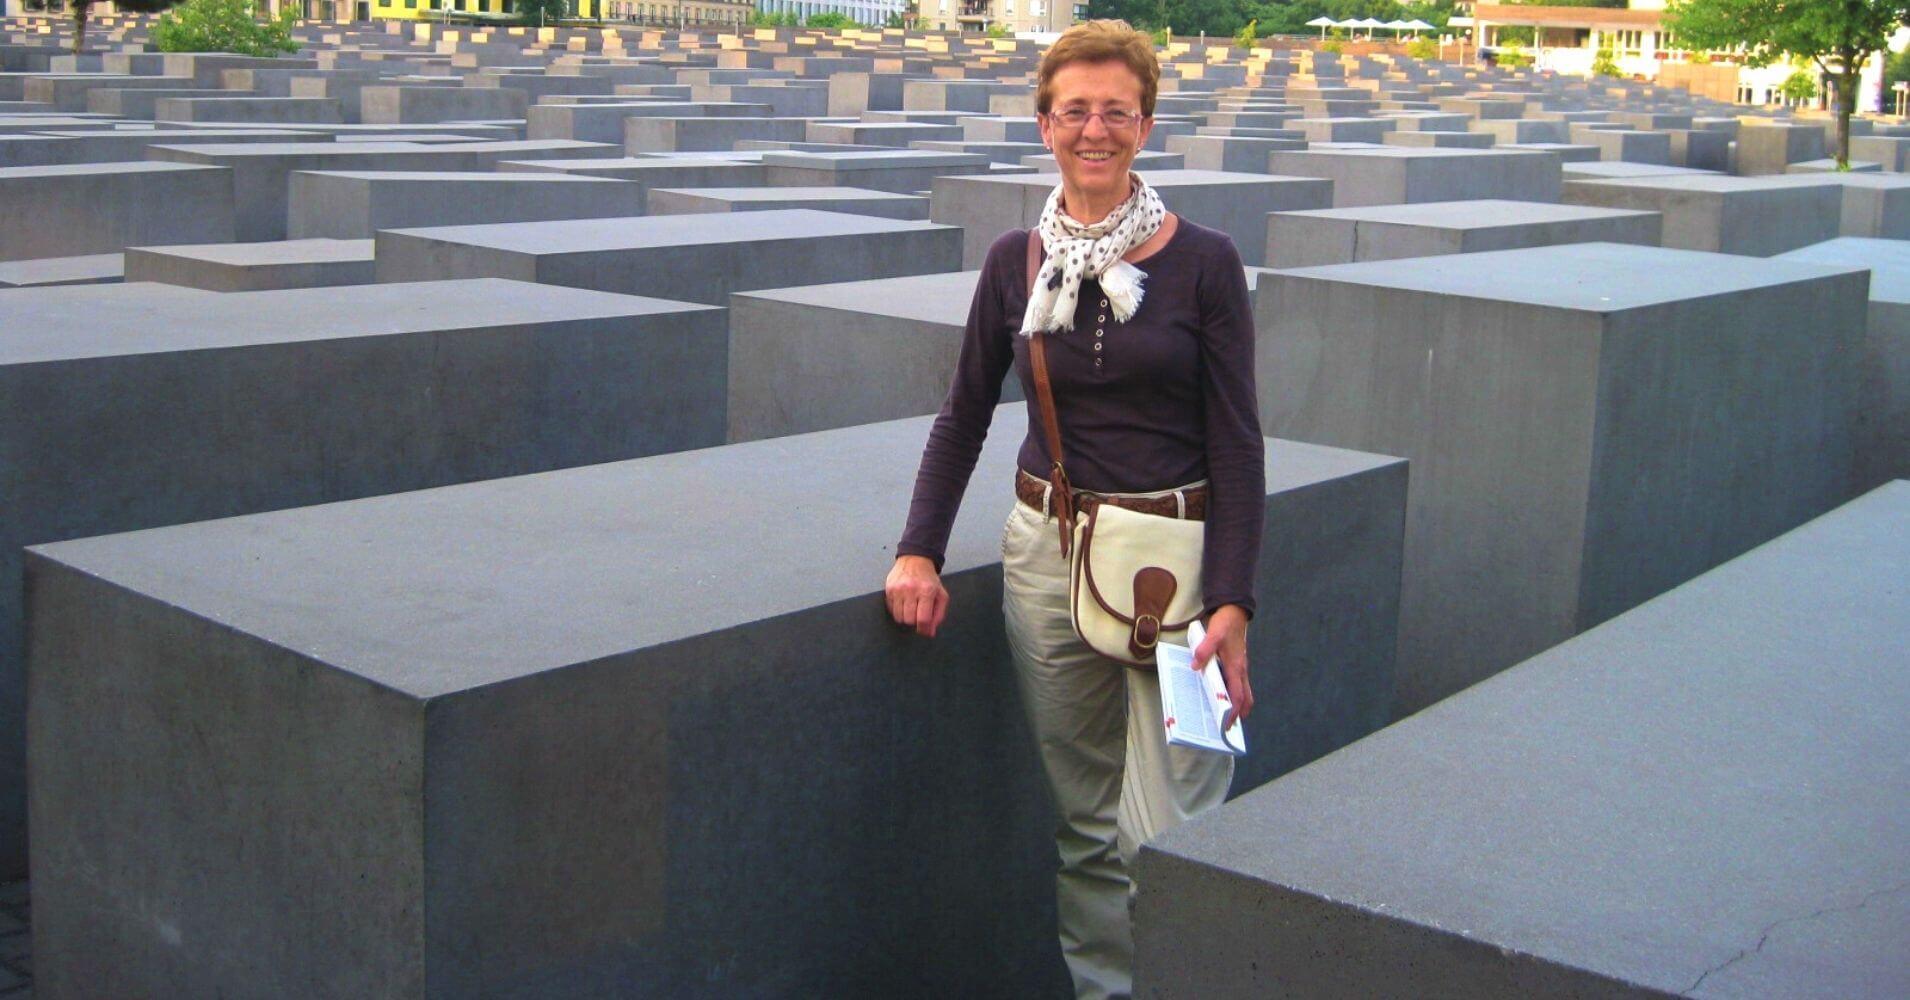 Monumento al Holocausto. Berlín. Alemania.